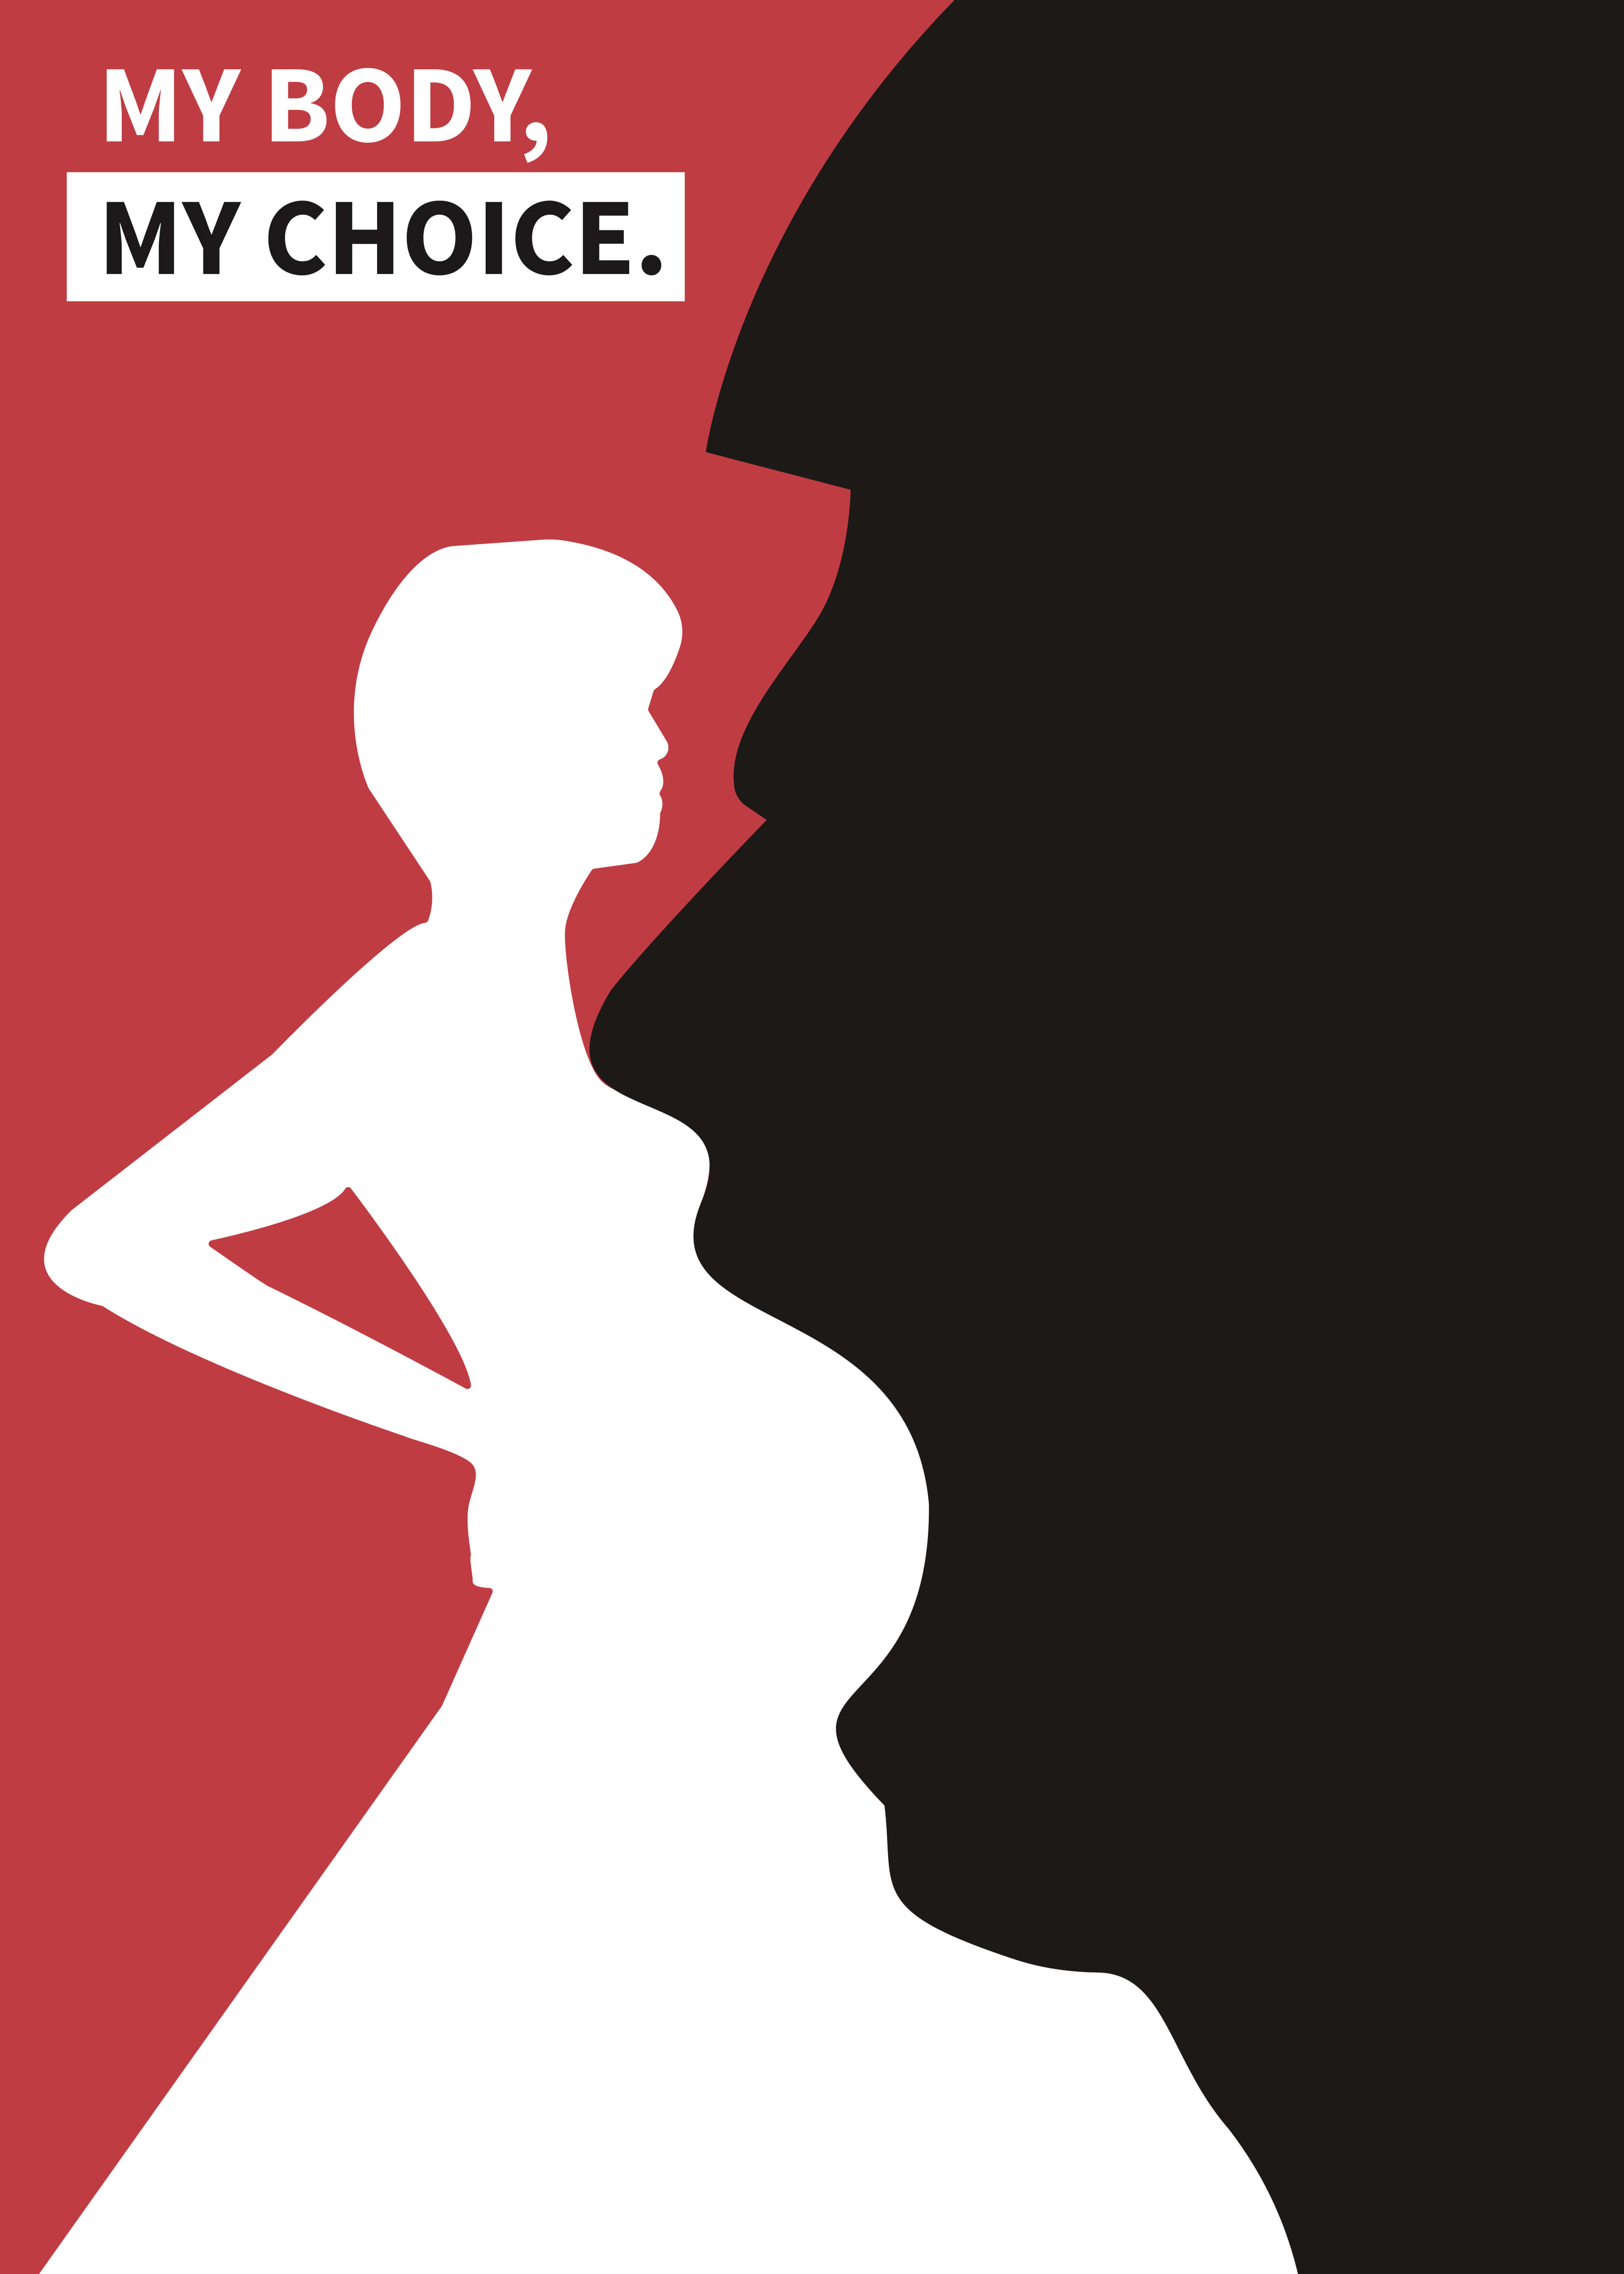 My Body, My Choice main image